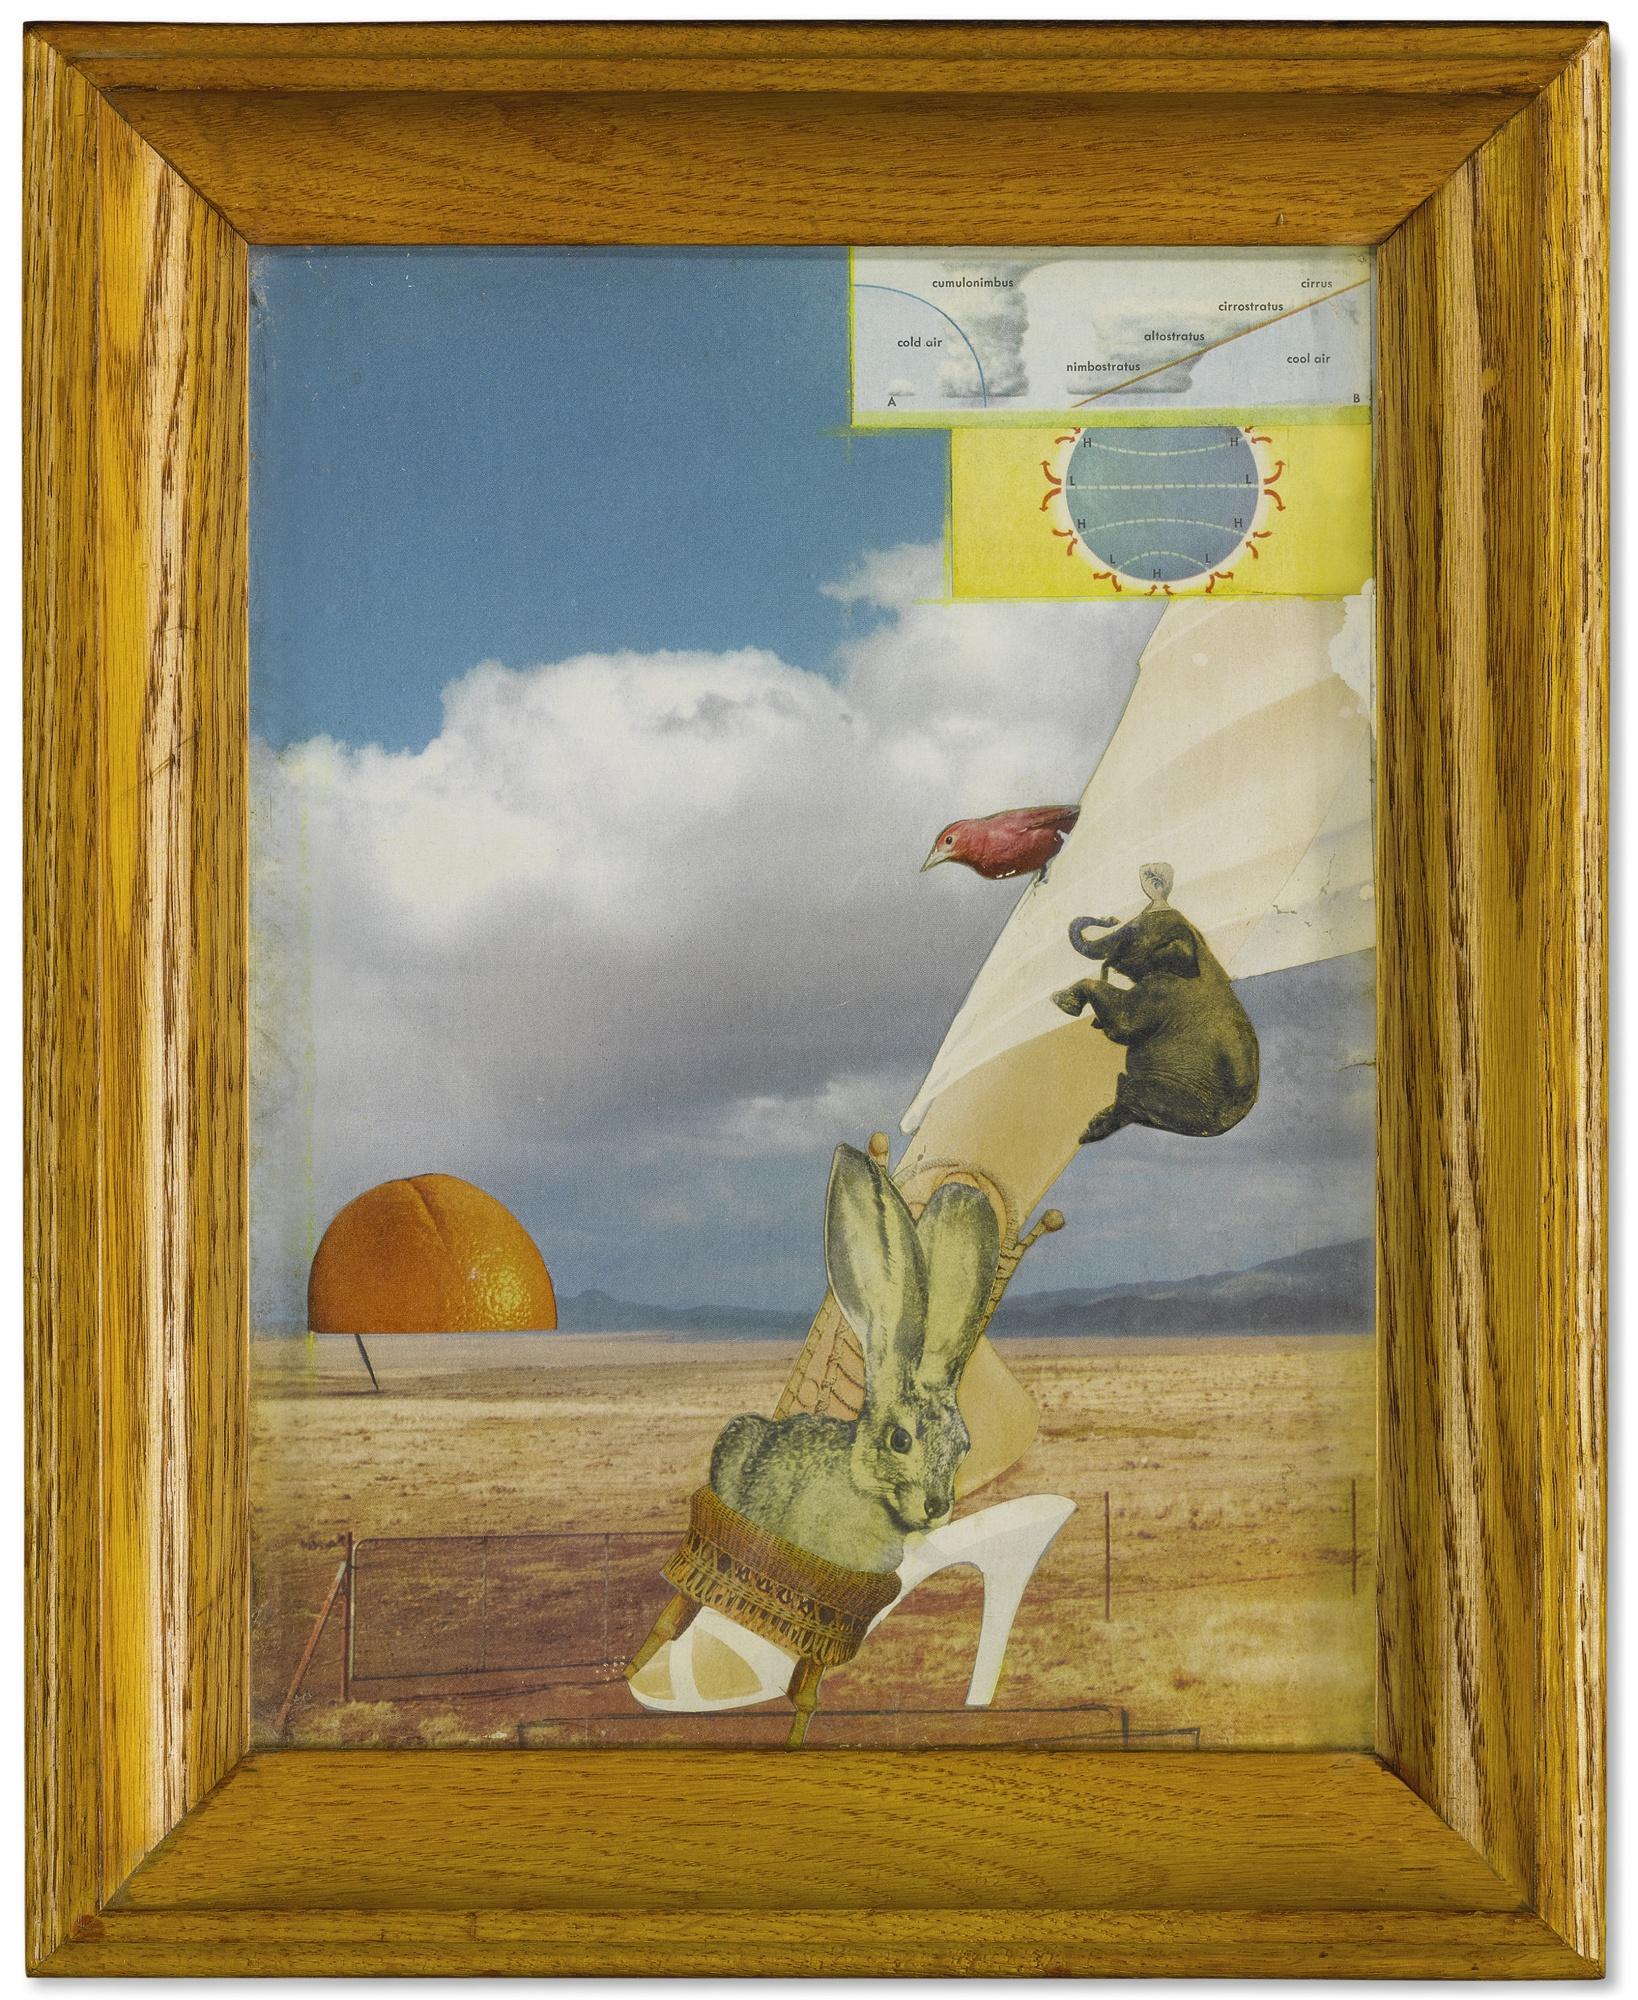 Joseph Cornell-Untitled-1960